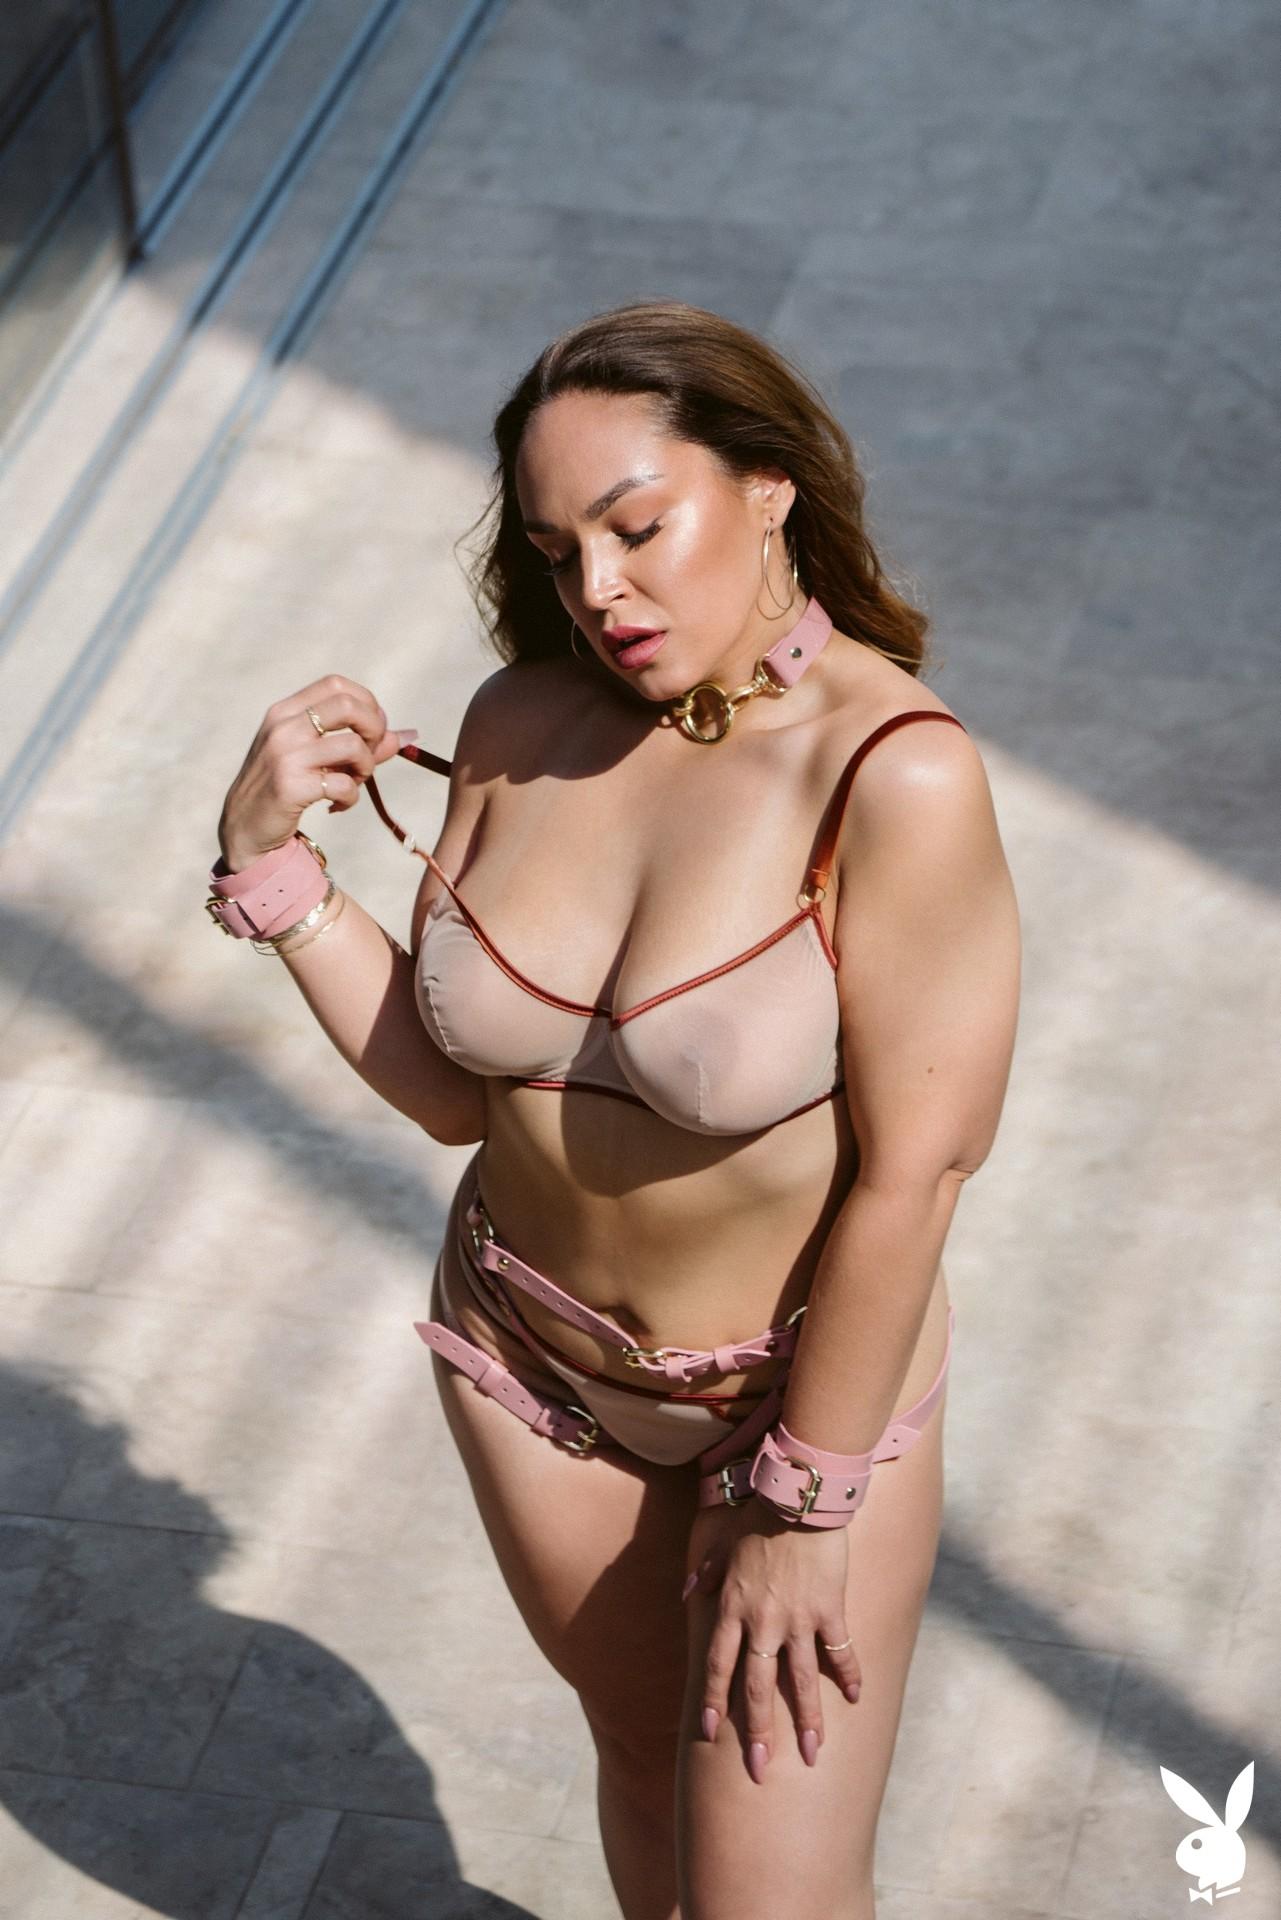 Sophia Grey In Different View Playboy Plus (4)